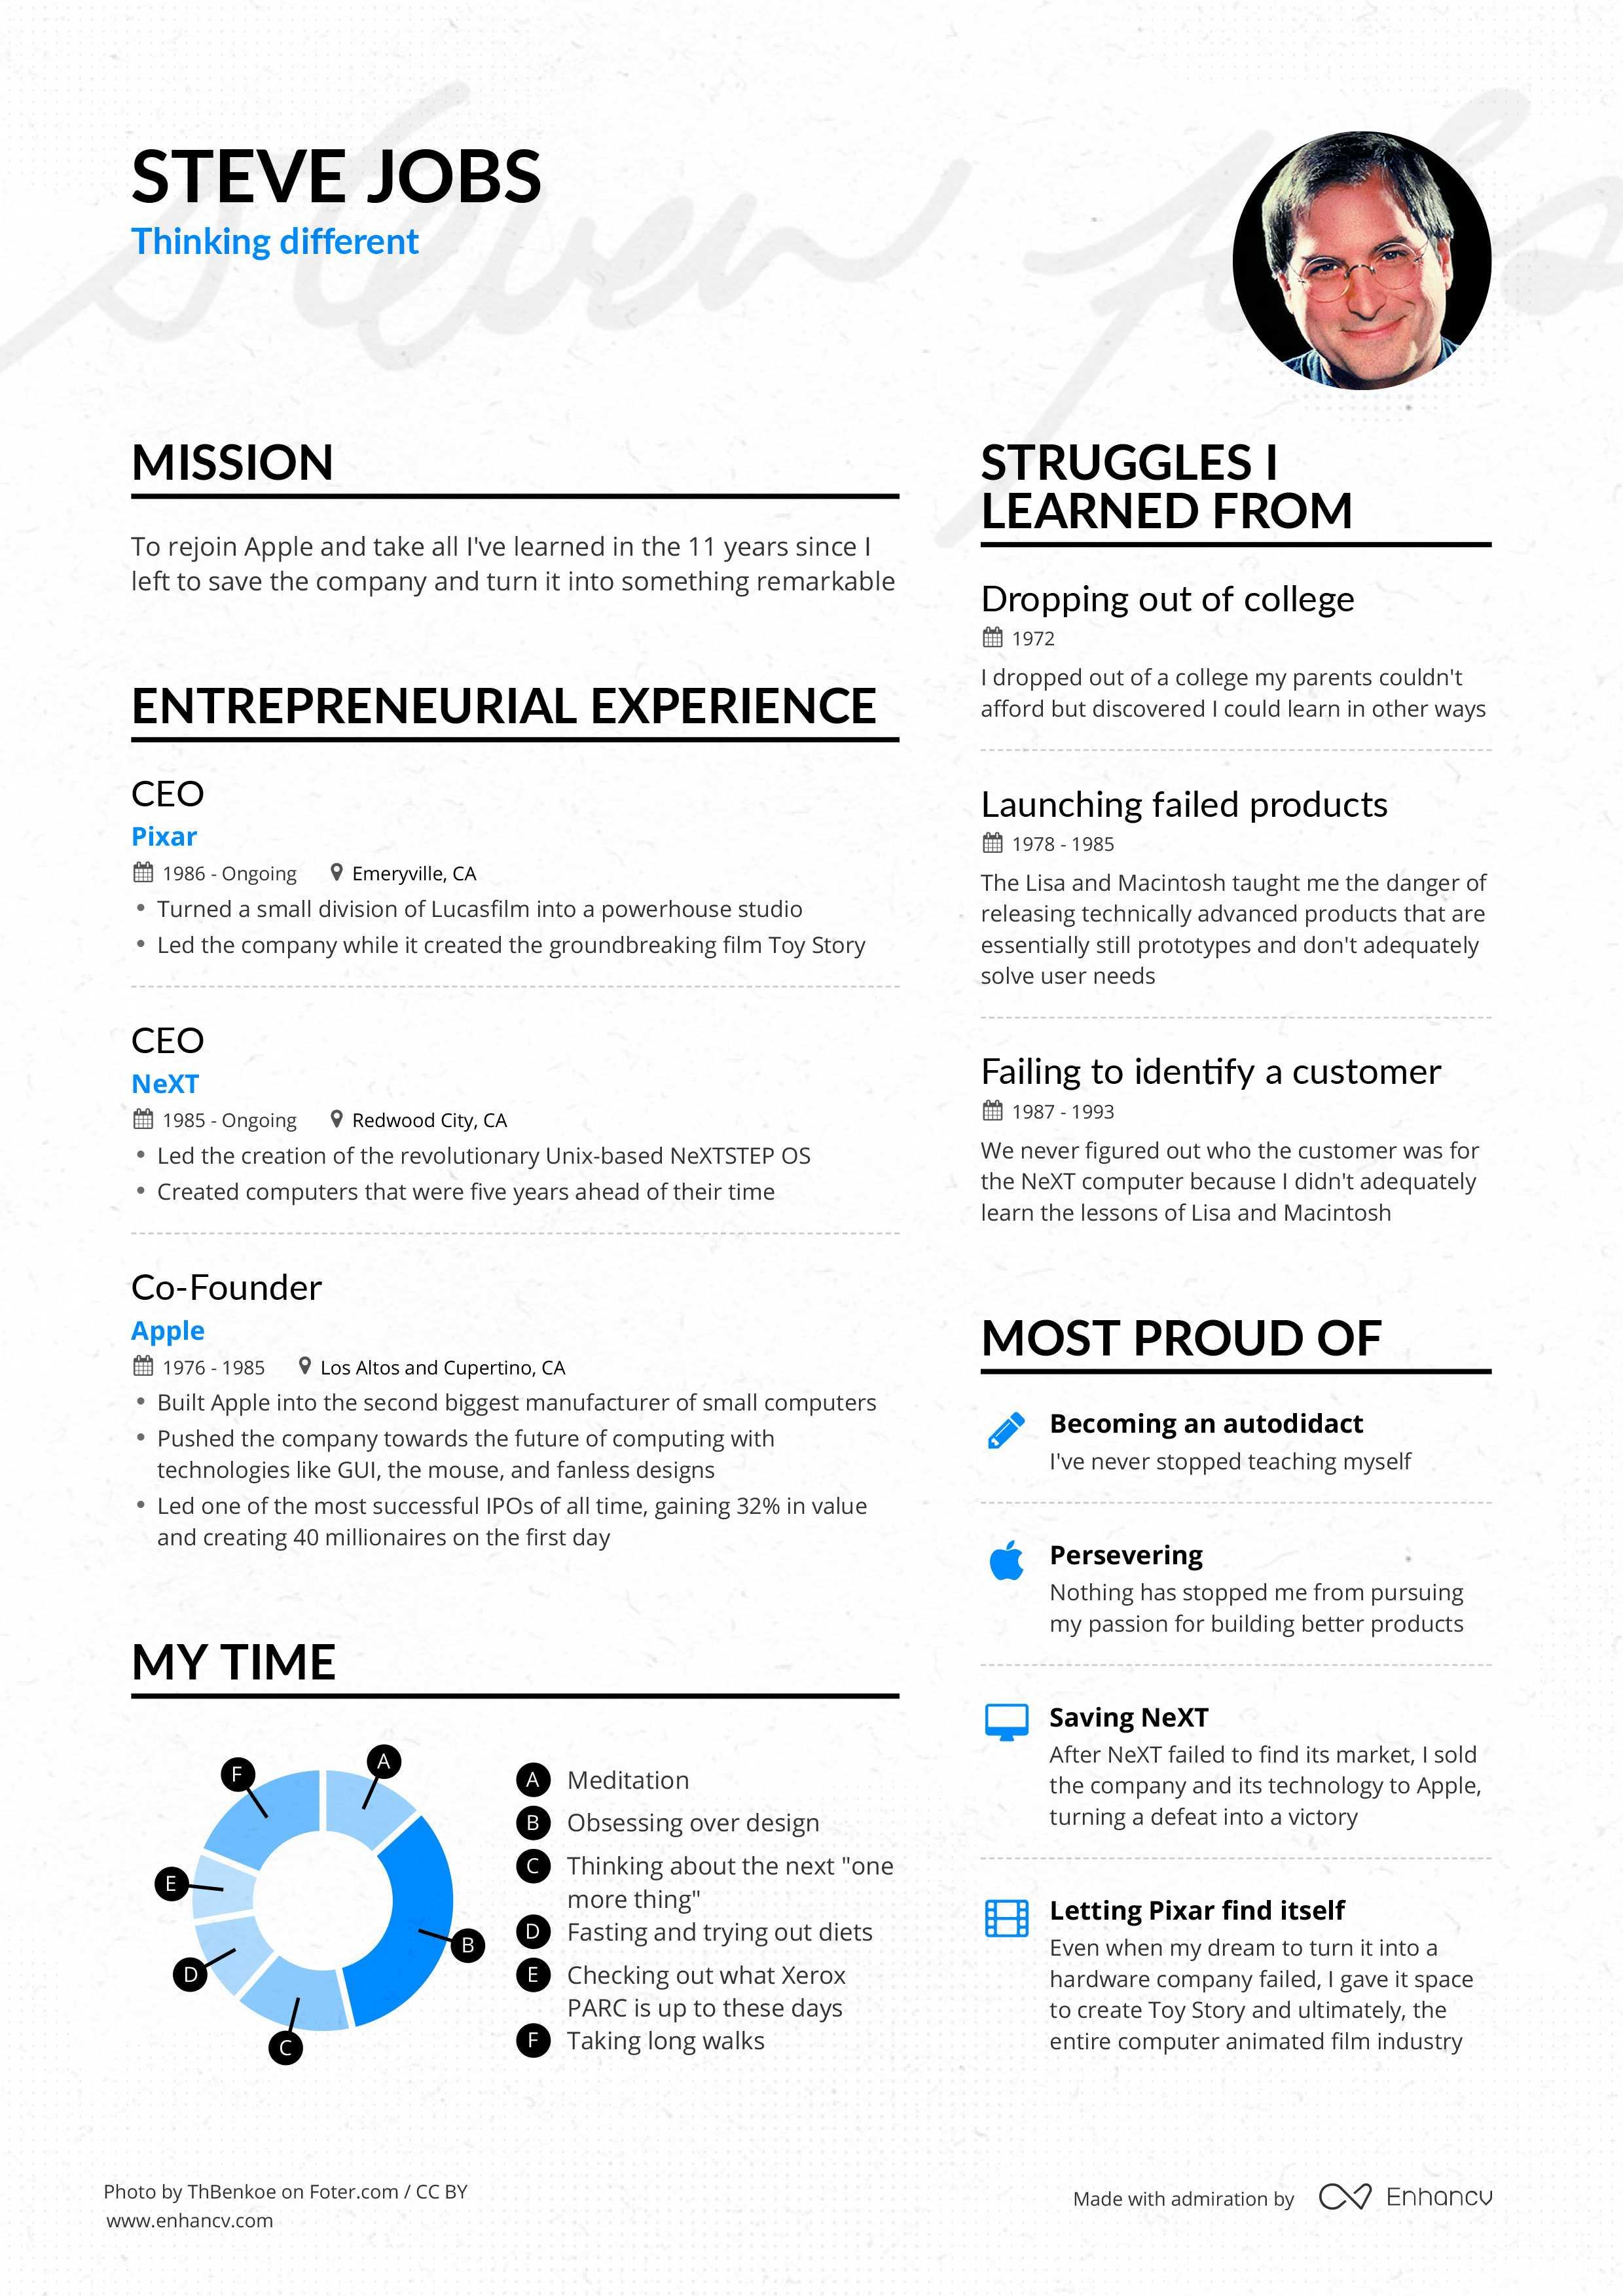 https://enhancv.com/static/62b4fedcd6f2ea443ee6c152de7ccc47/9e2df/steve-jobs-resume.jpg